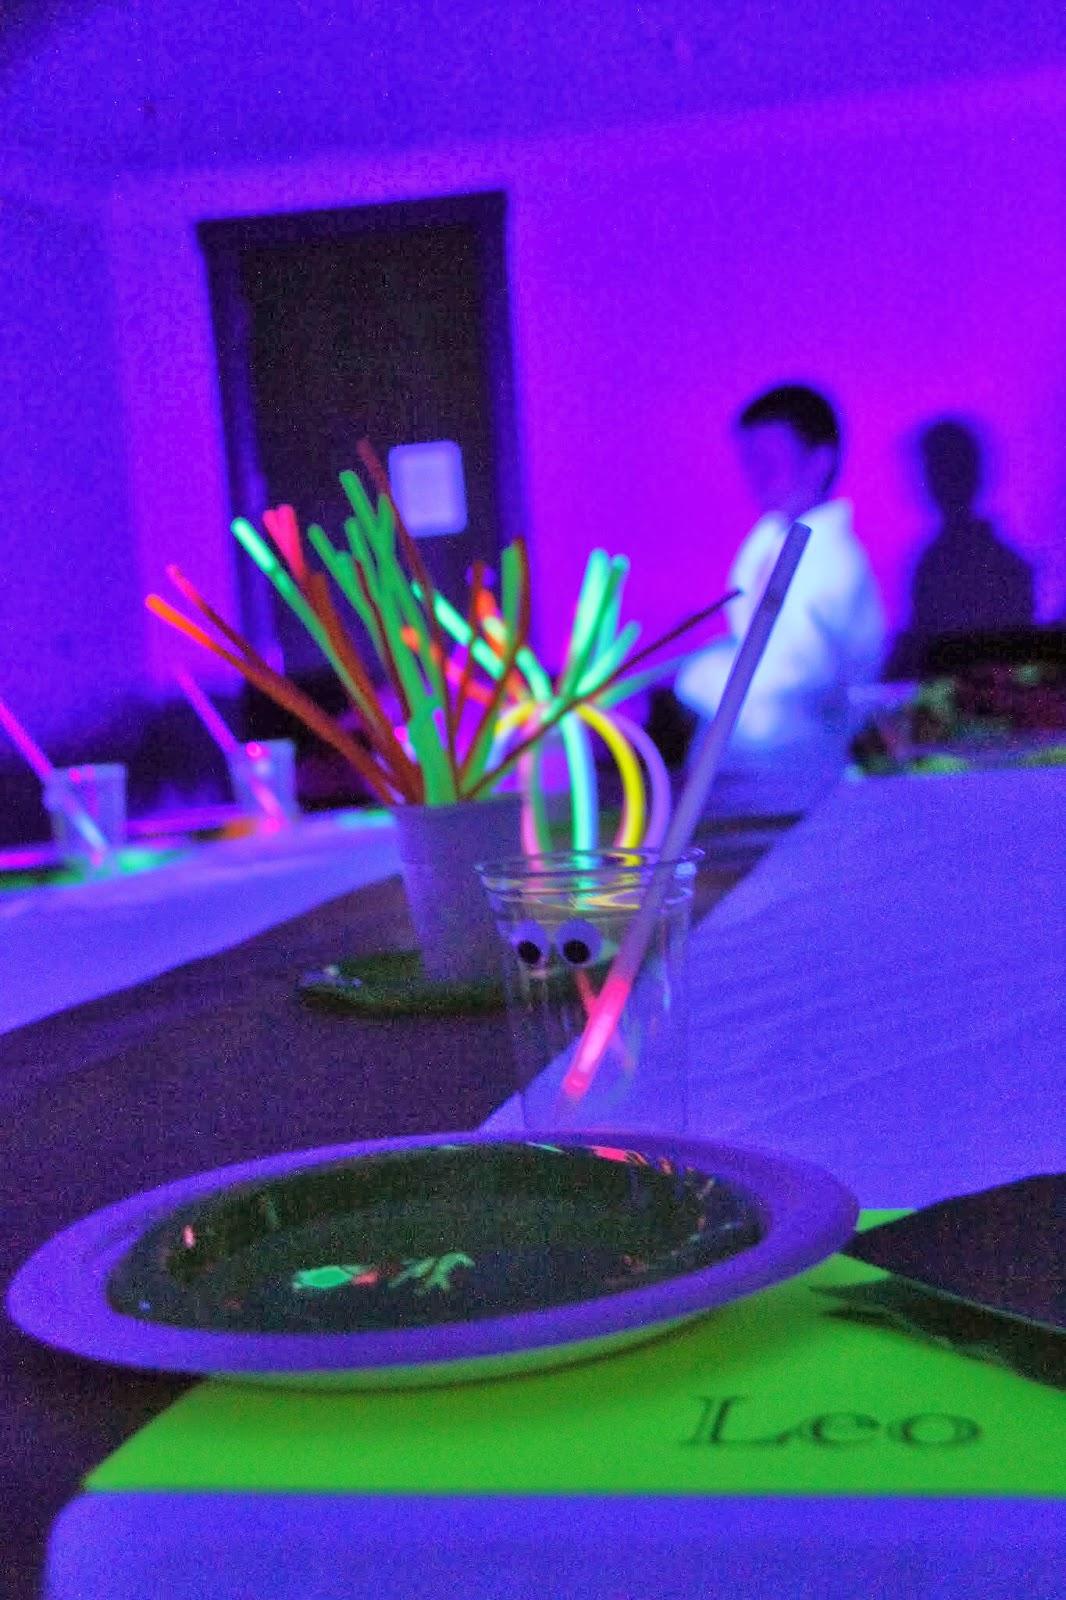 THREElittleBIRDS' : Neon/Glow in the Dark Birthday Party